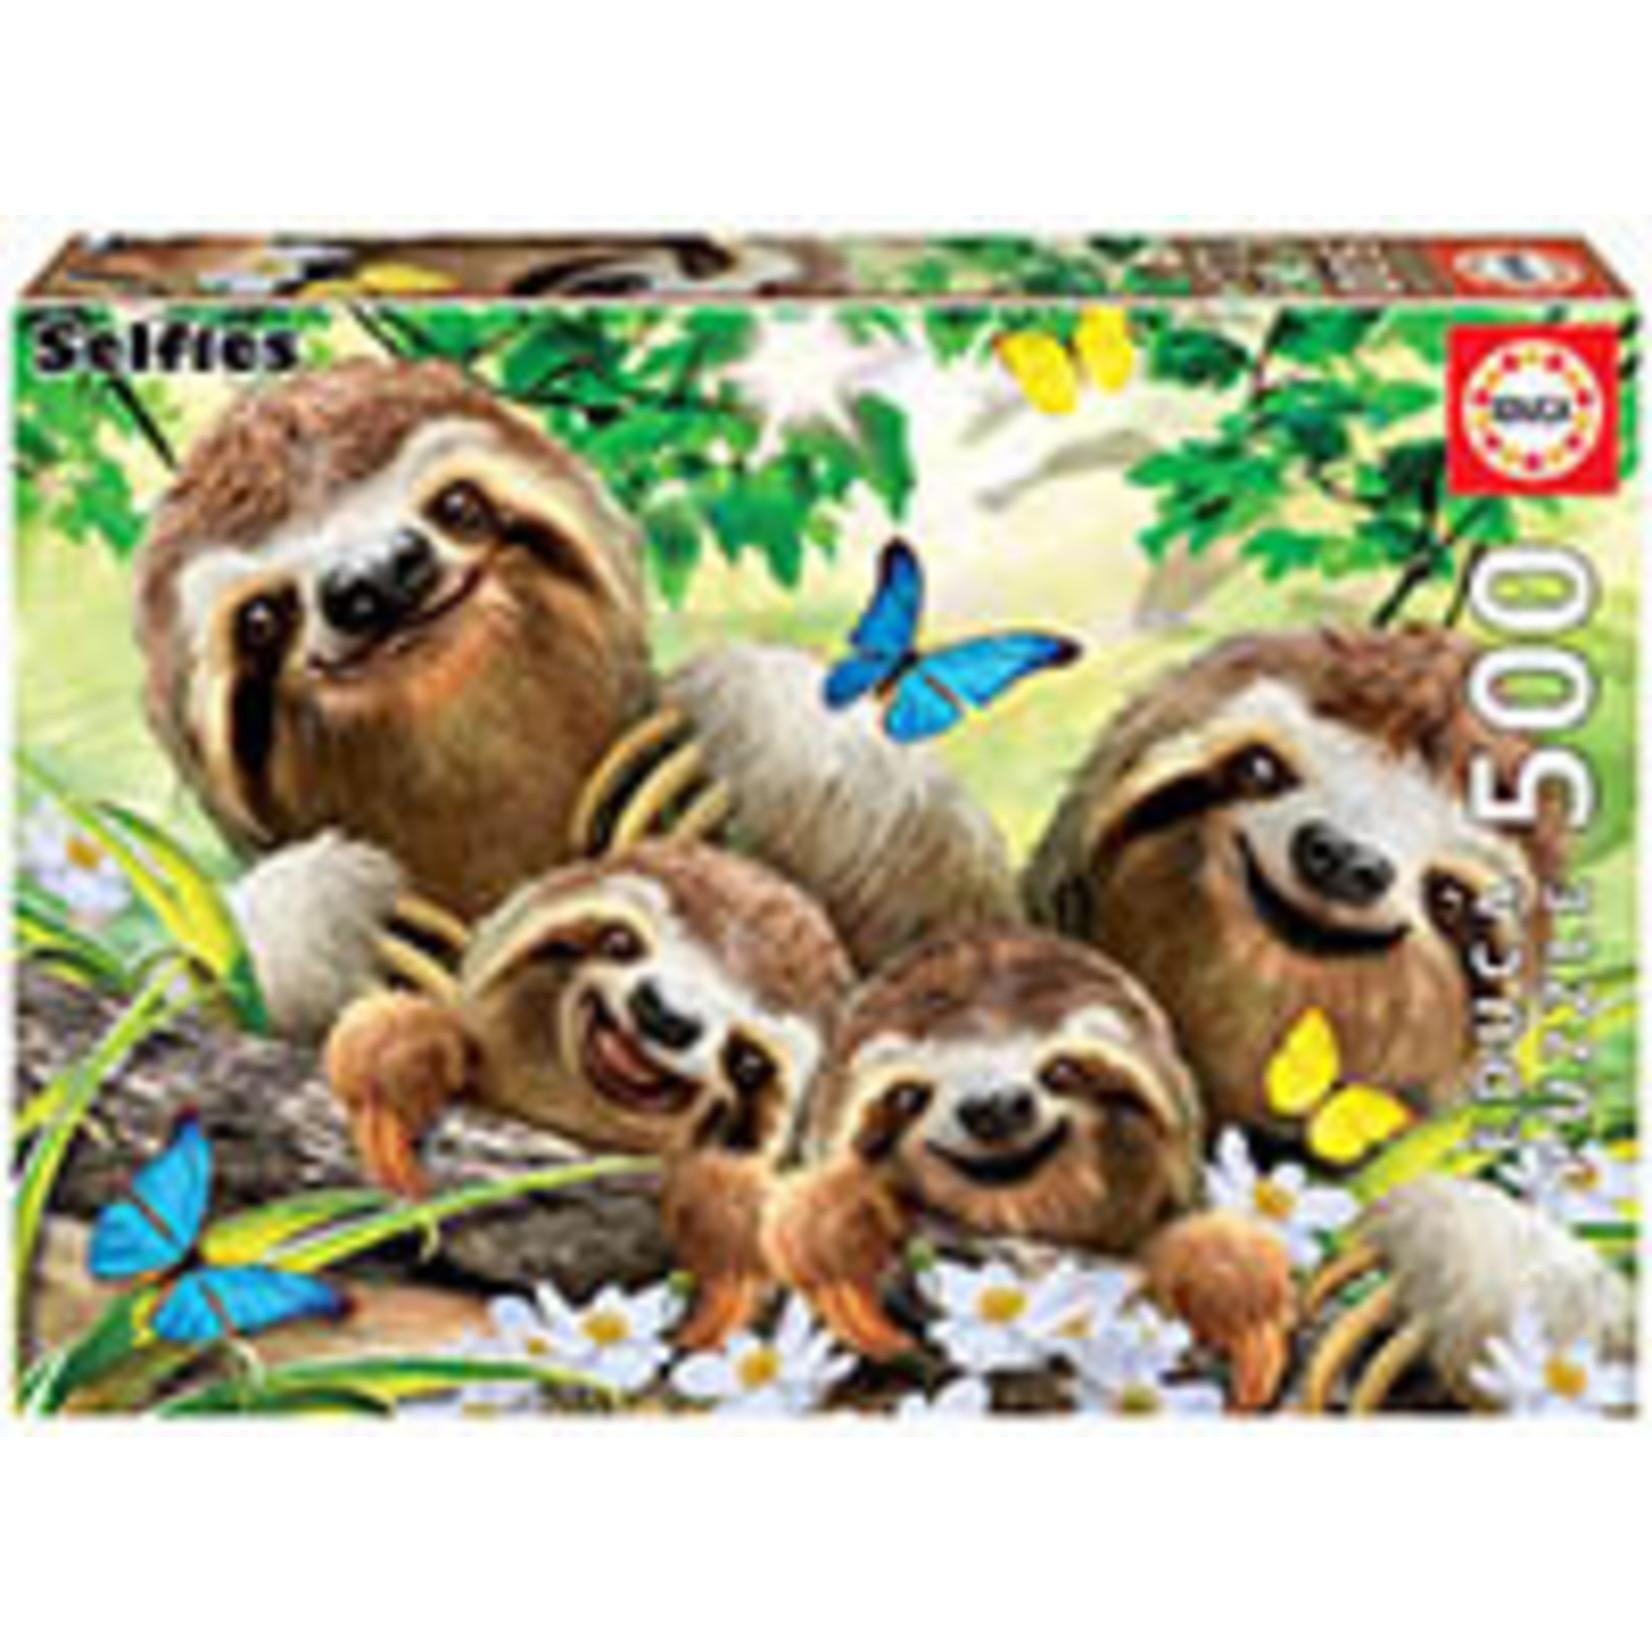 Educa Puzzles Sloth Family Selfie 500pc